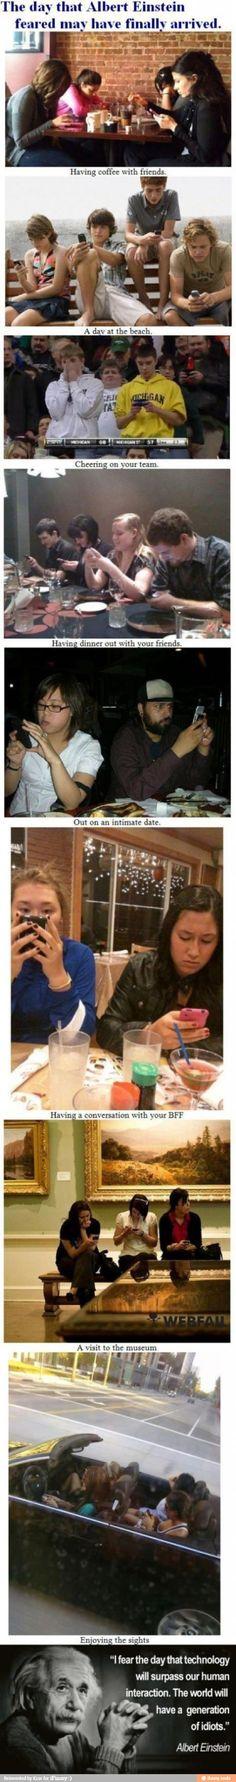 Funny. Sad. True.